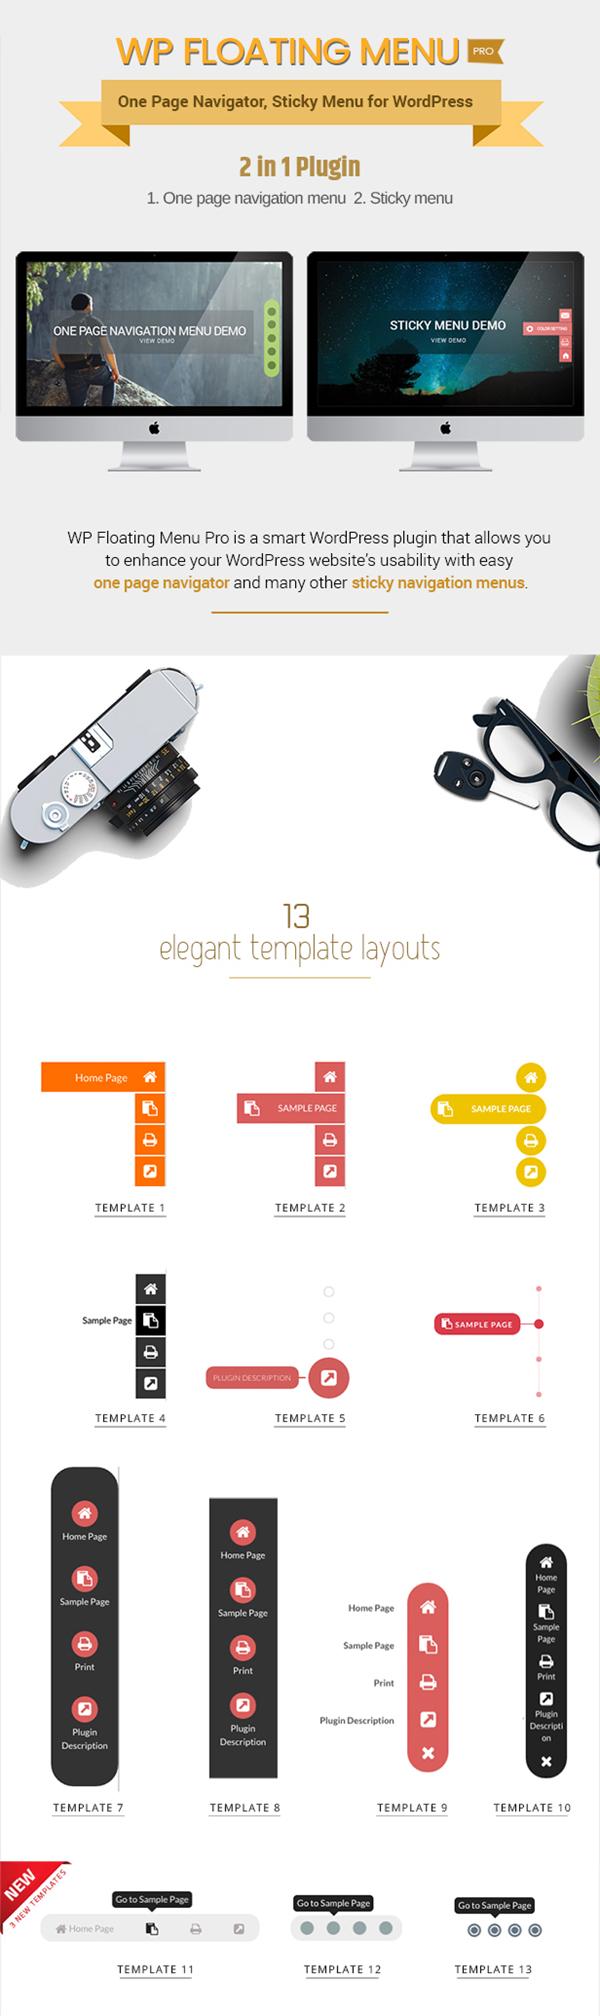 WP Floating Menu Pro - One page navigator, sticky menu for WordPress - 2